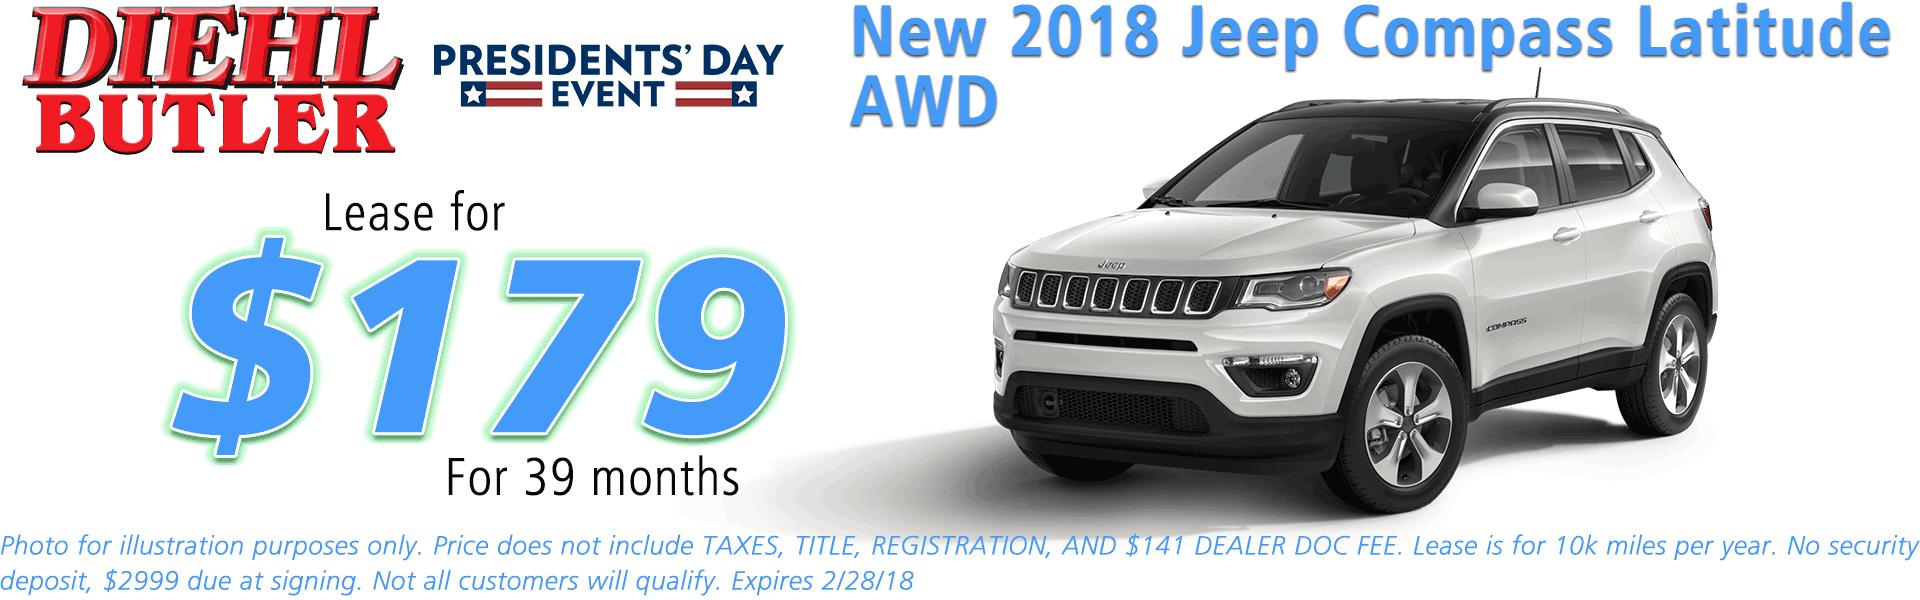 NEW 2018 JEEP COMPASS LATITUDE 4X4 diehl automotive butler pa 16002 chrysler jeep dodge ram